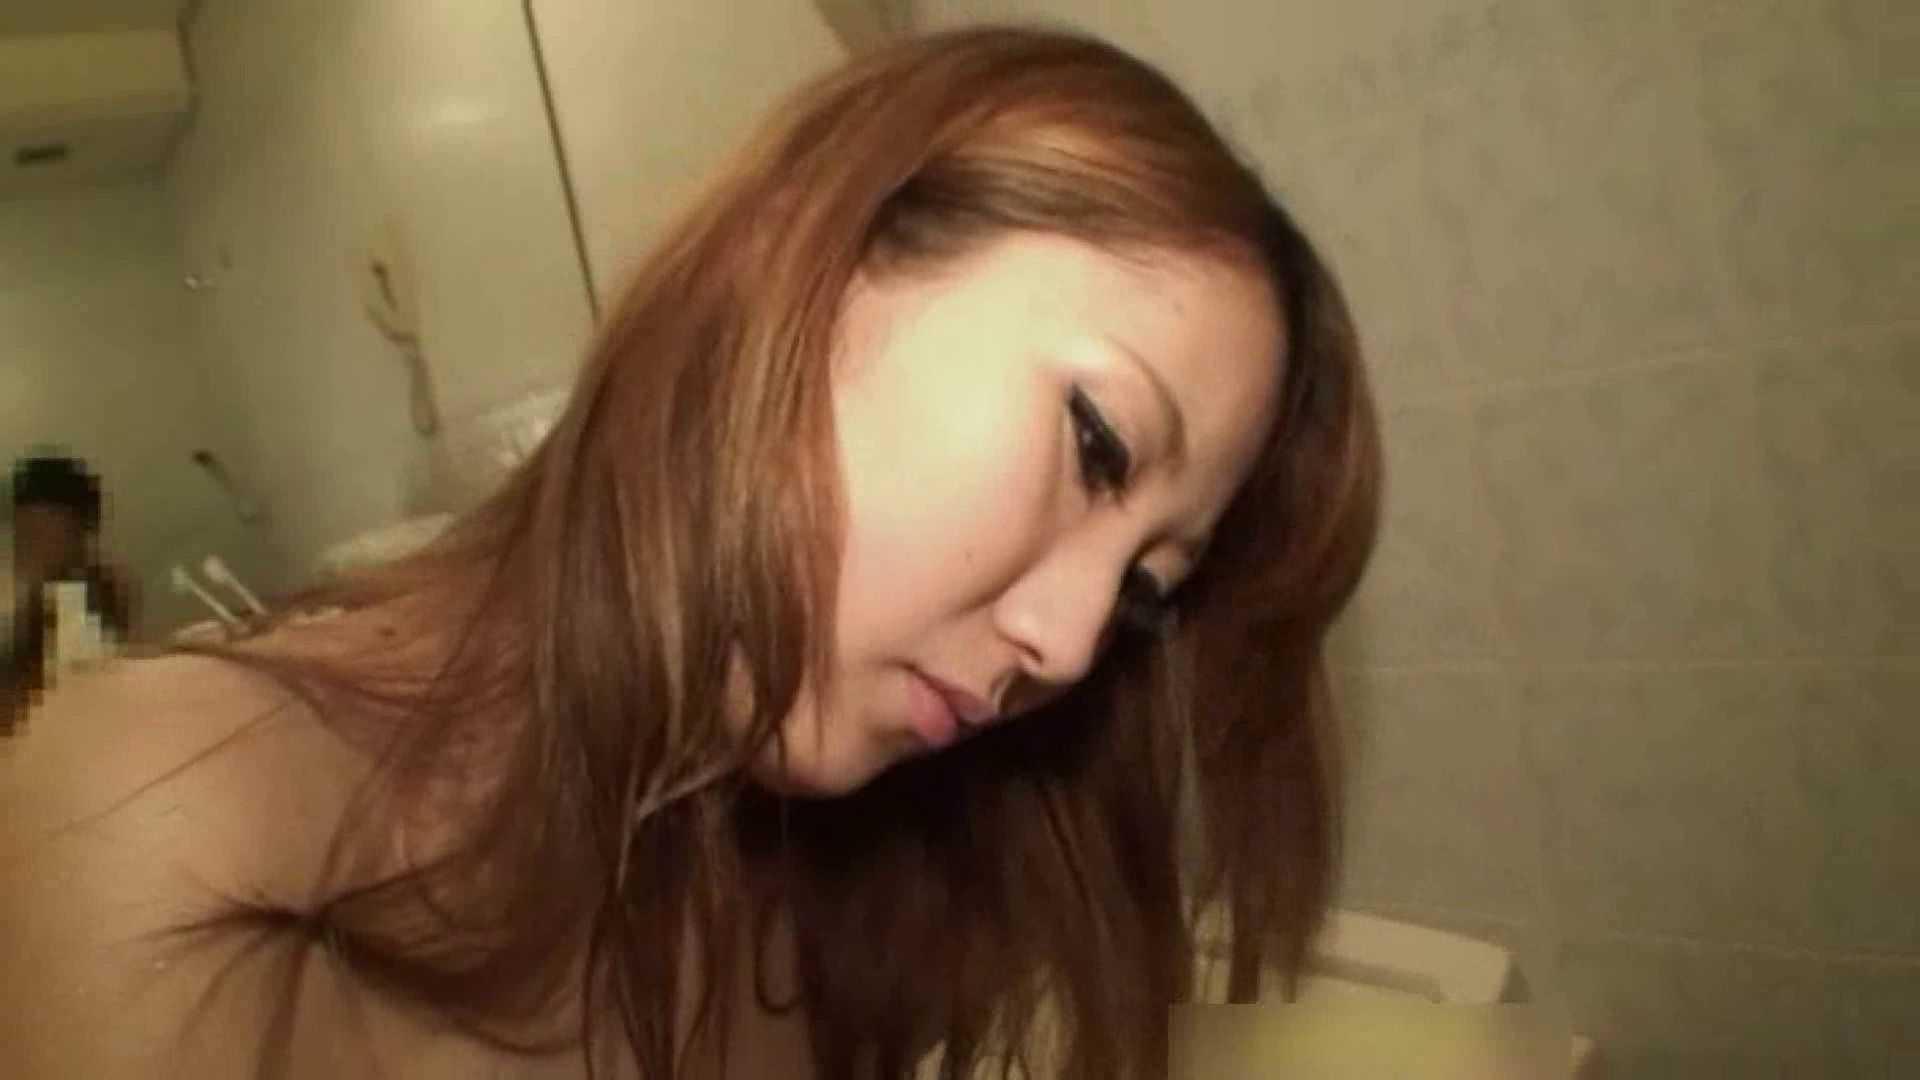 S級厳選美女ビッチガールVol.02 美女  95枚 79